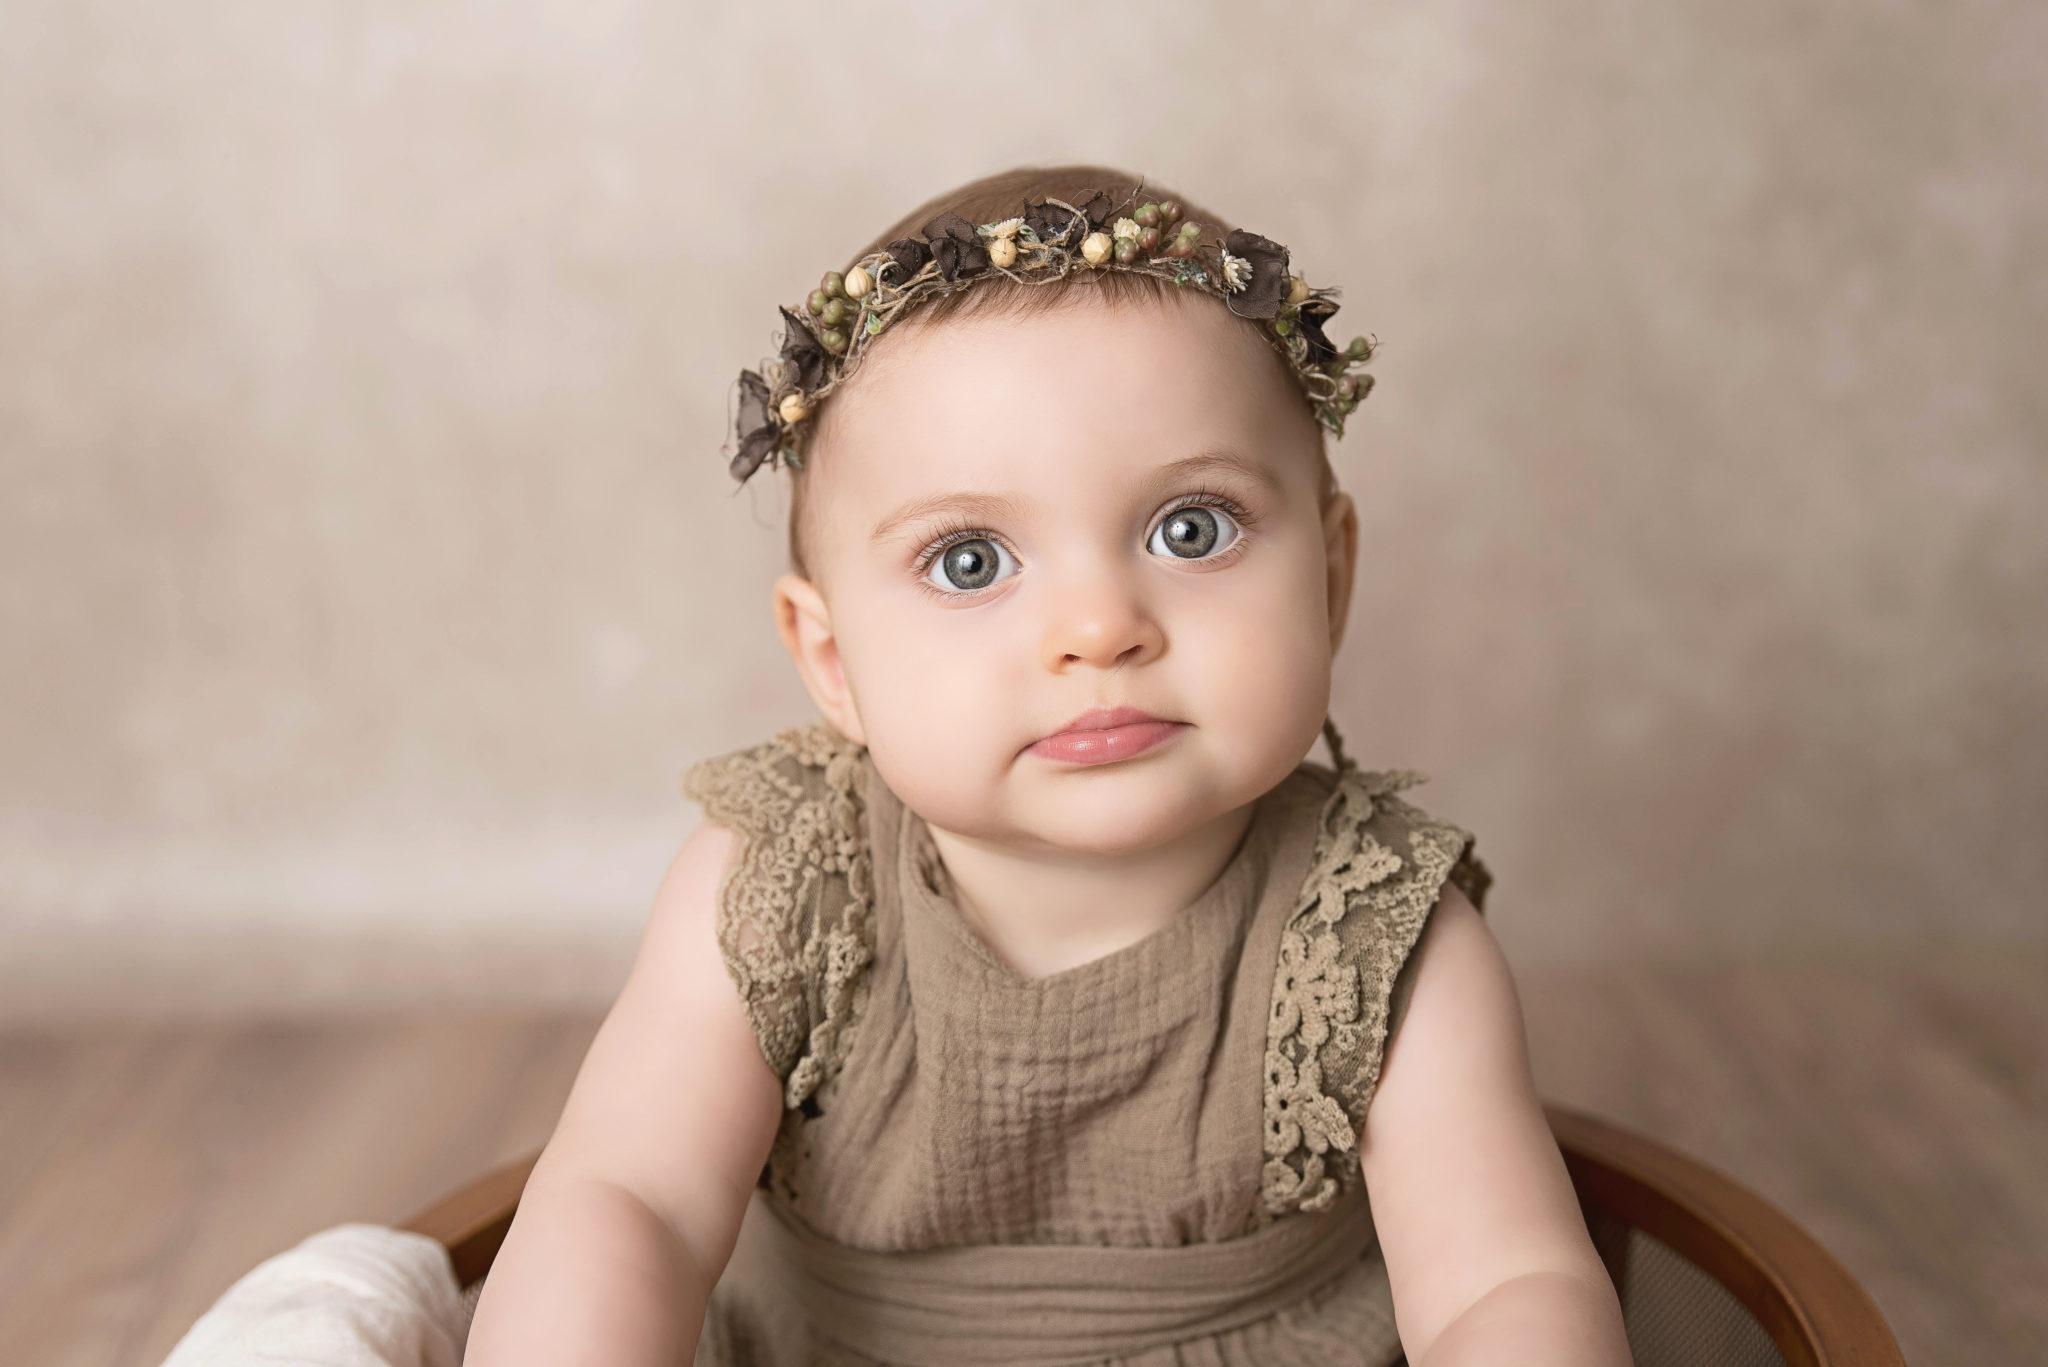 Photographe bébé oise seine et marne val d'oise ainse (27)